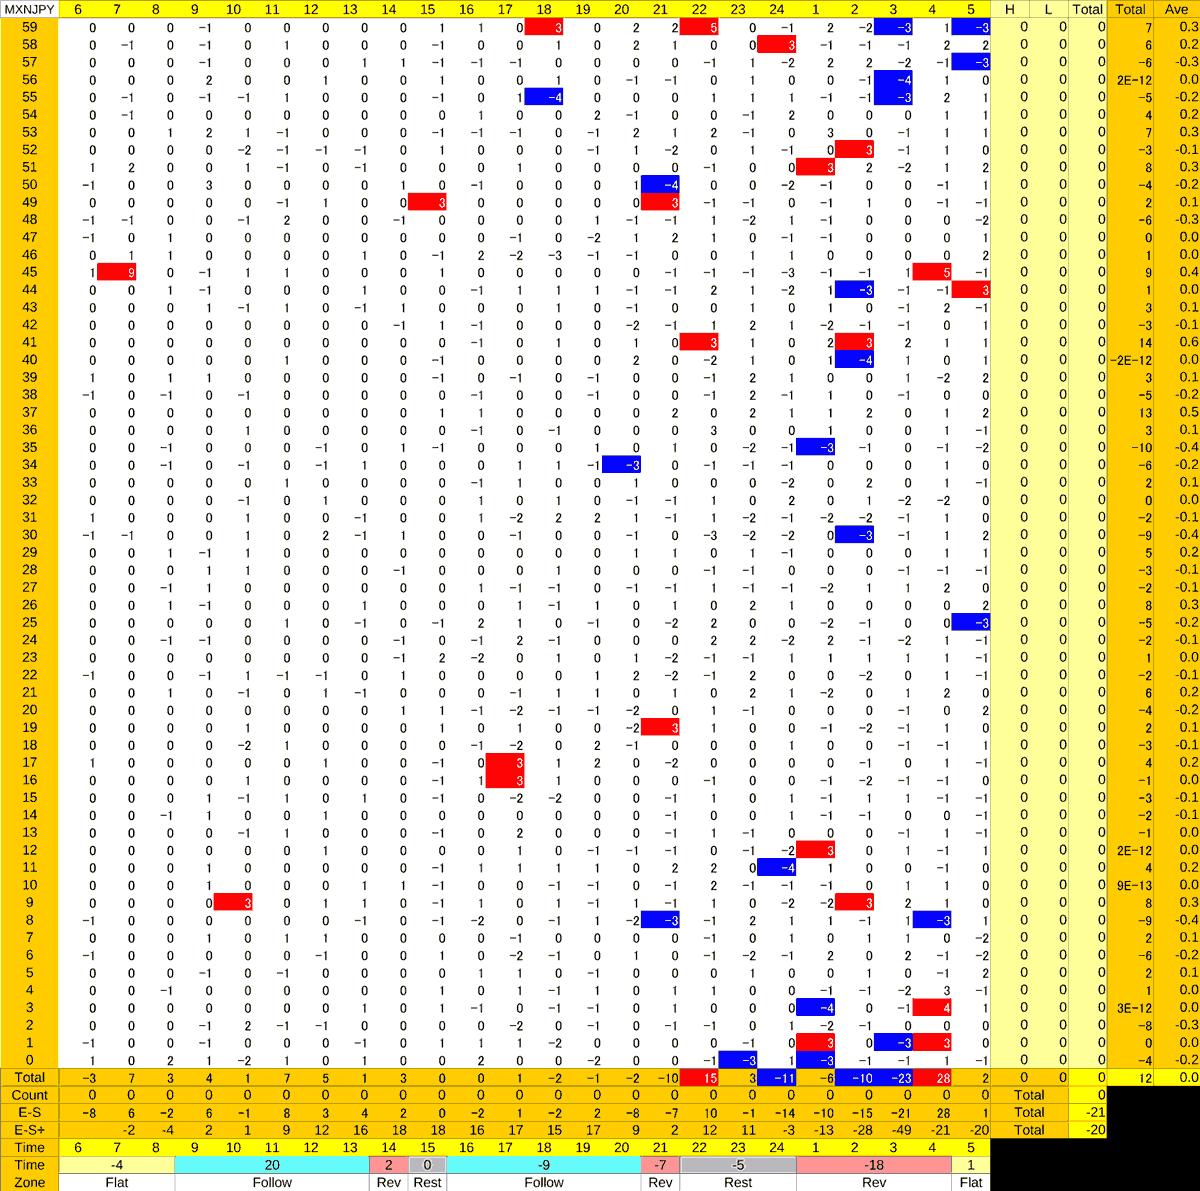 20201209_HS(3)MXNJPY